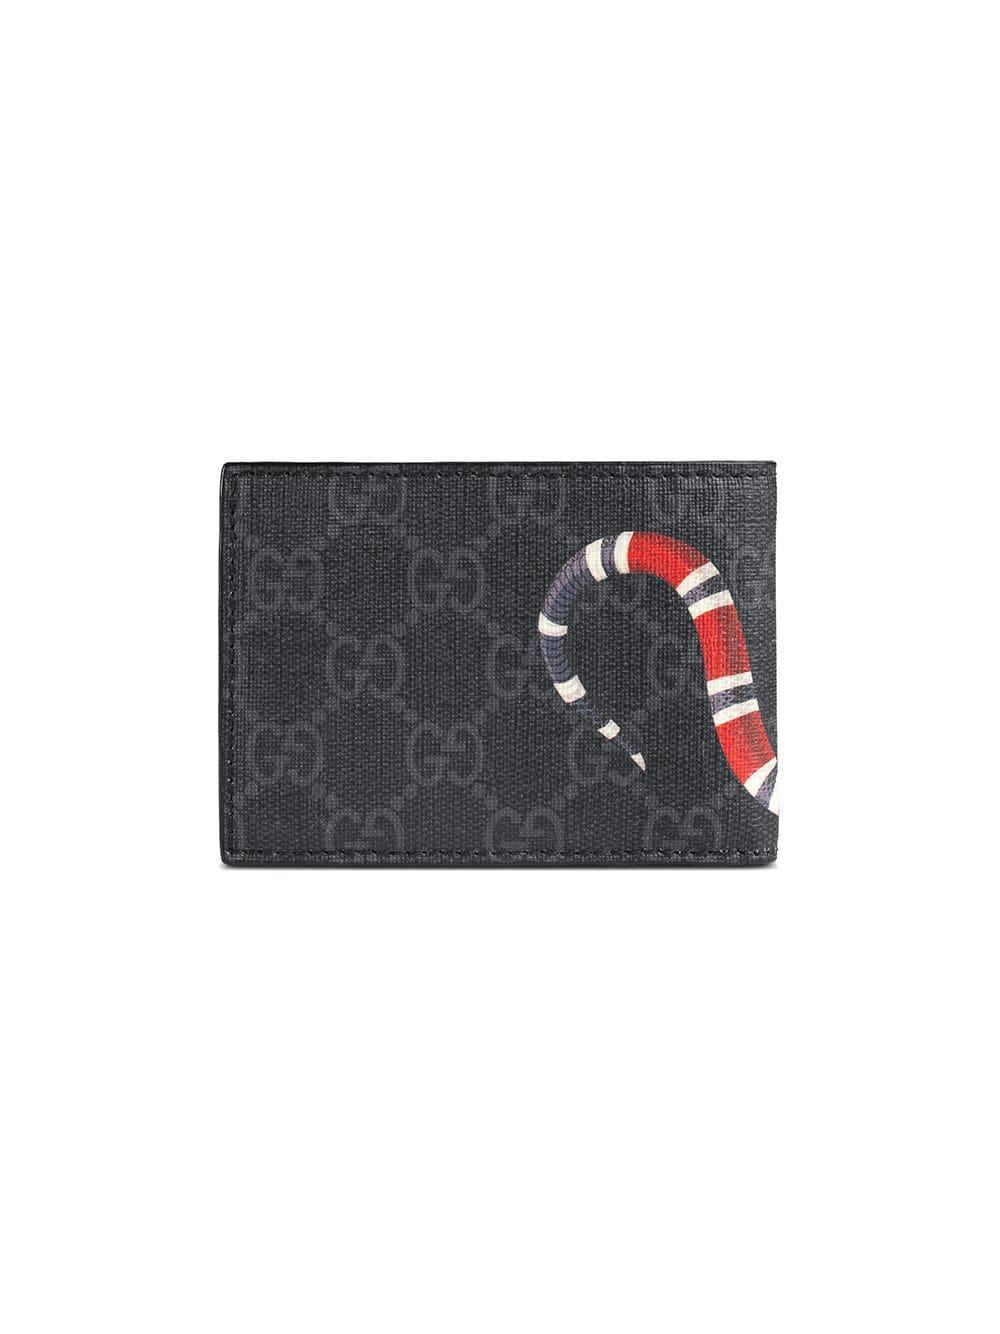 c437cf7ef7de Gucci - Black Kingsnake Print GG Supreme Wallet for Men - Lyst. View  fullscreen